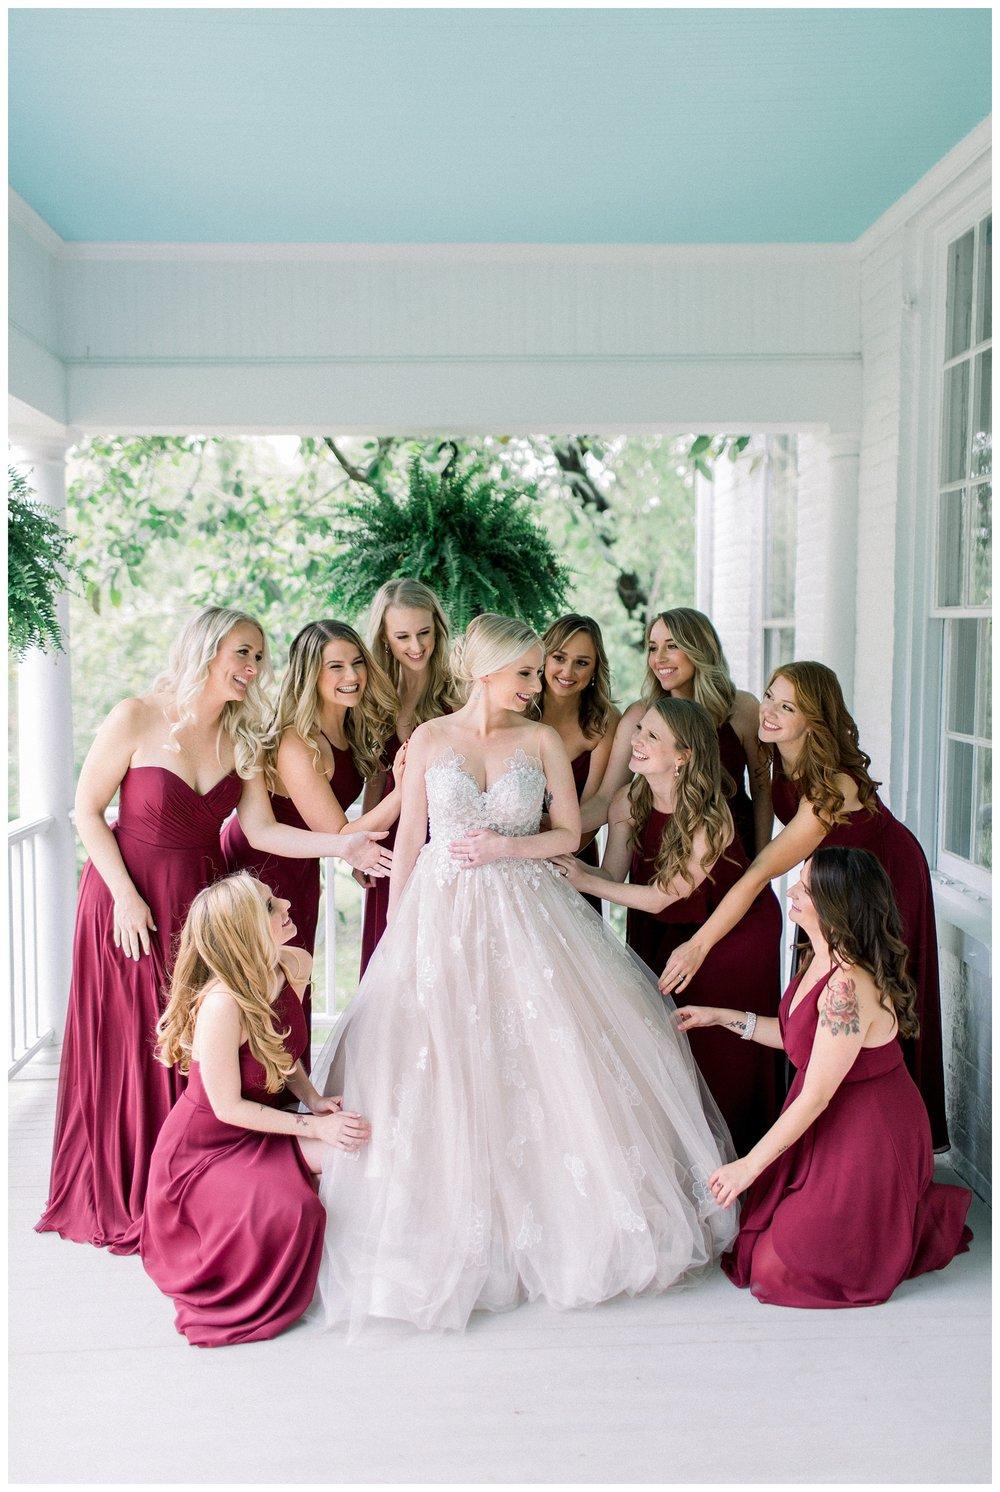 Whitehall Estate Wedding | Northern Virginia Wedding Photographer Kir Tuben_0032.jpg